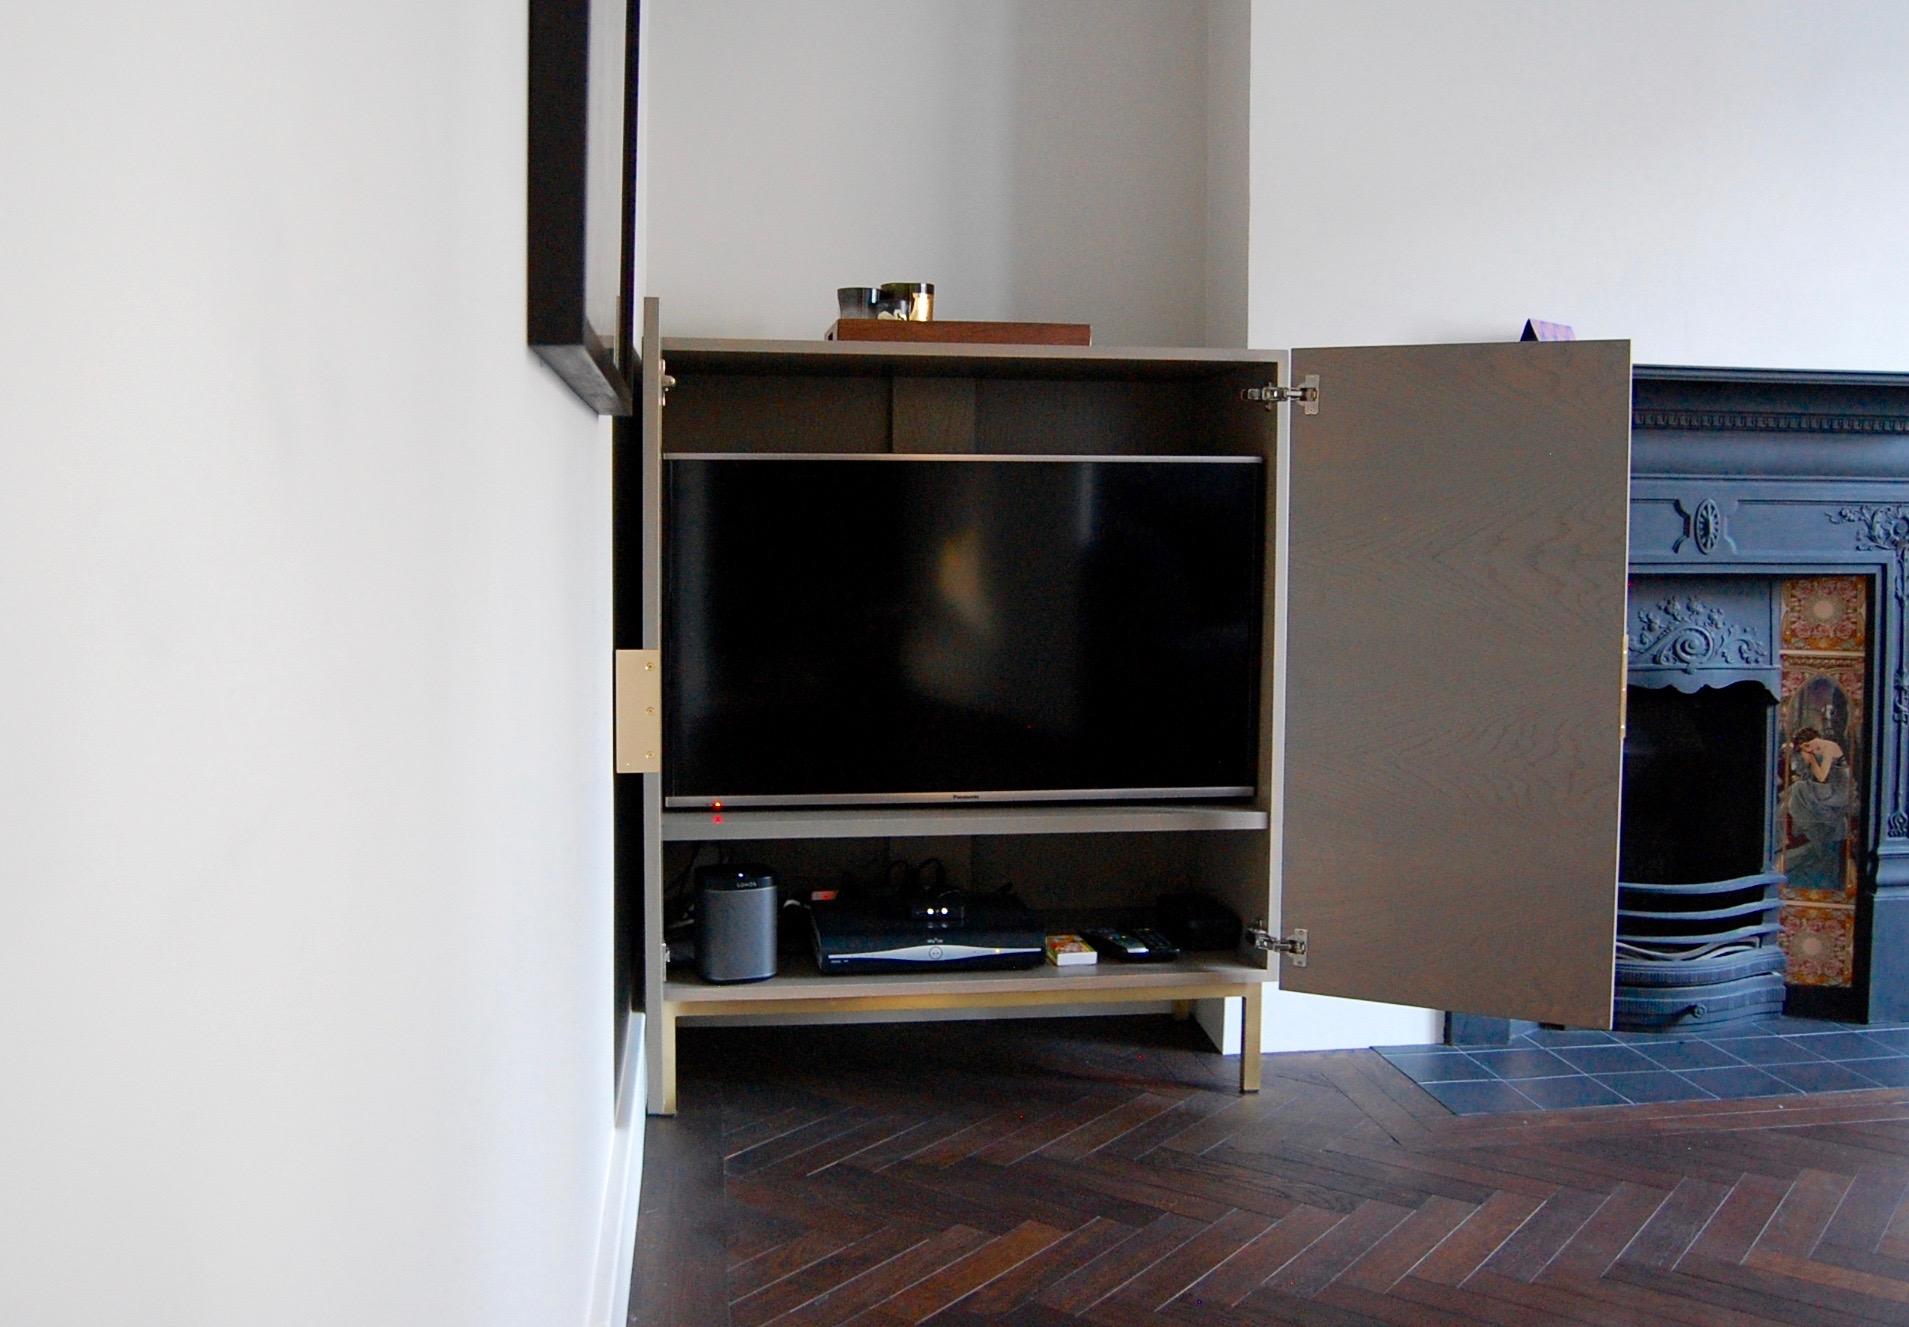 Grain_Bespoke_Furniture_TV_Cabinet_2.jpg